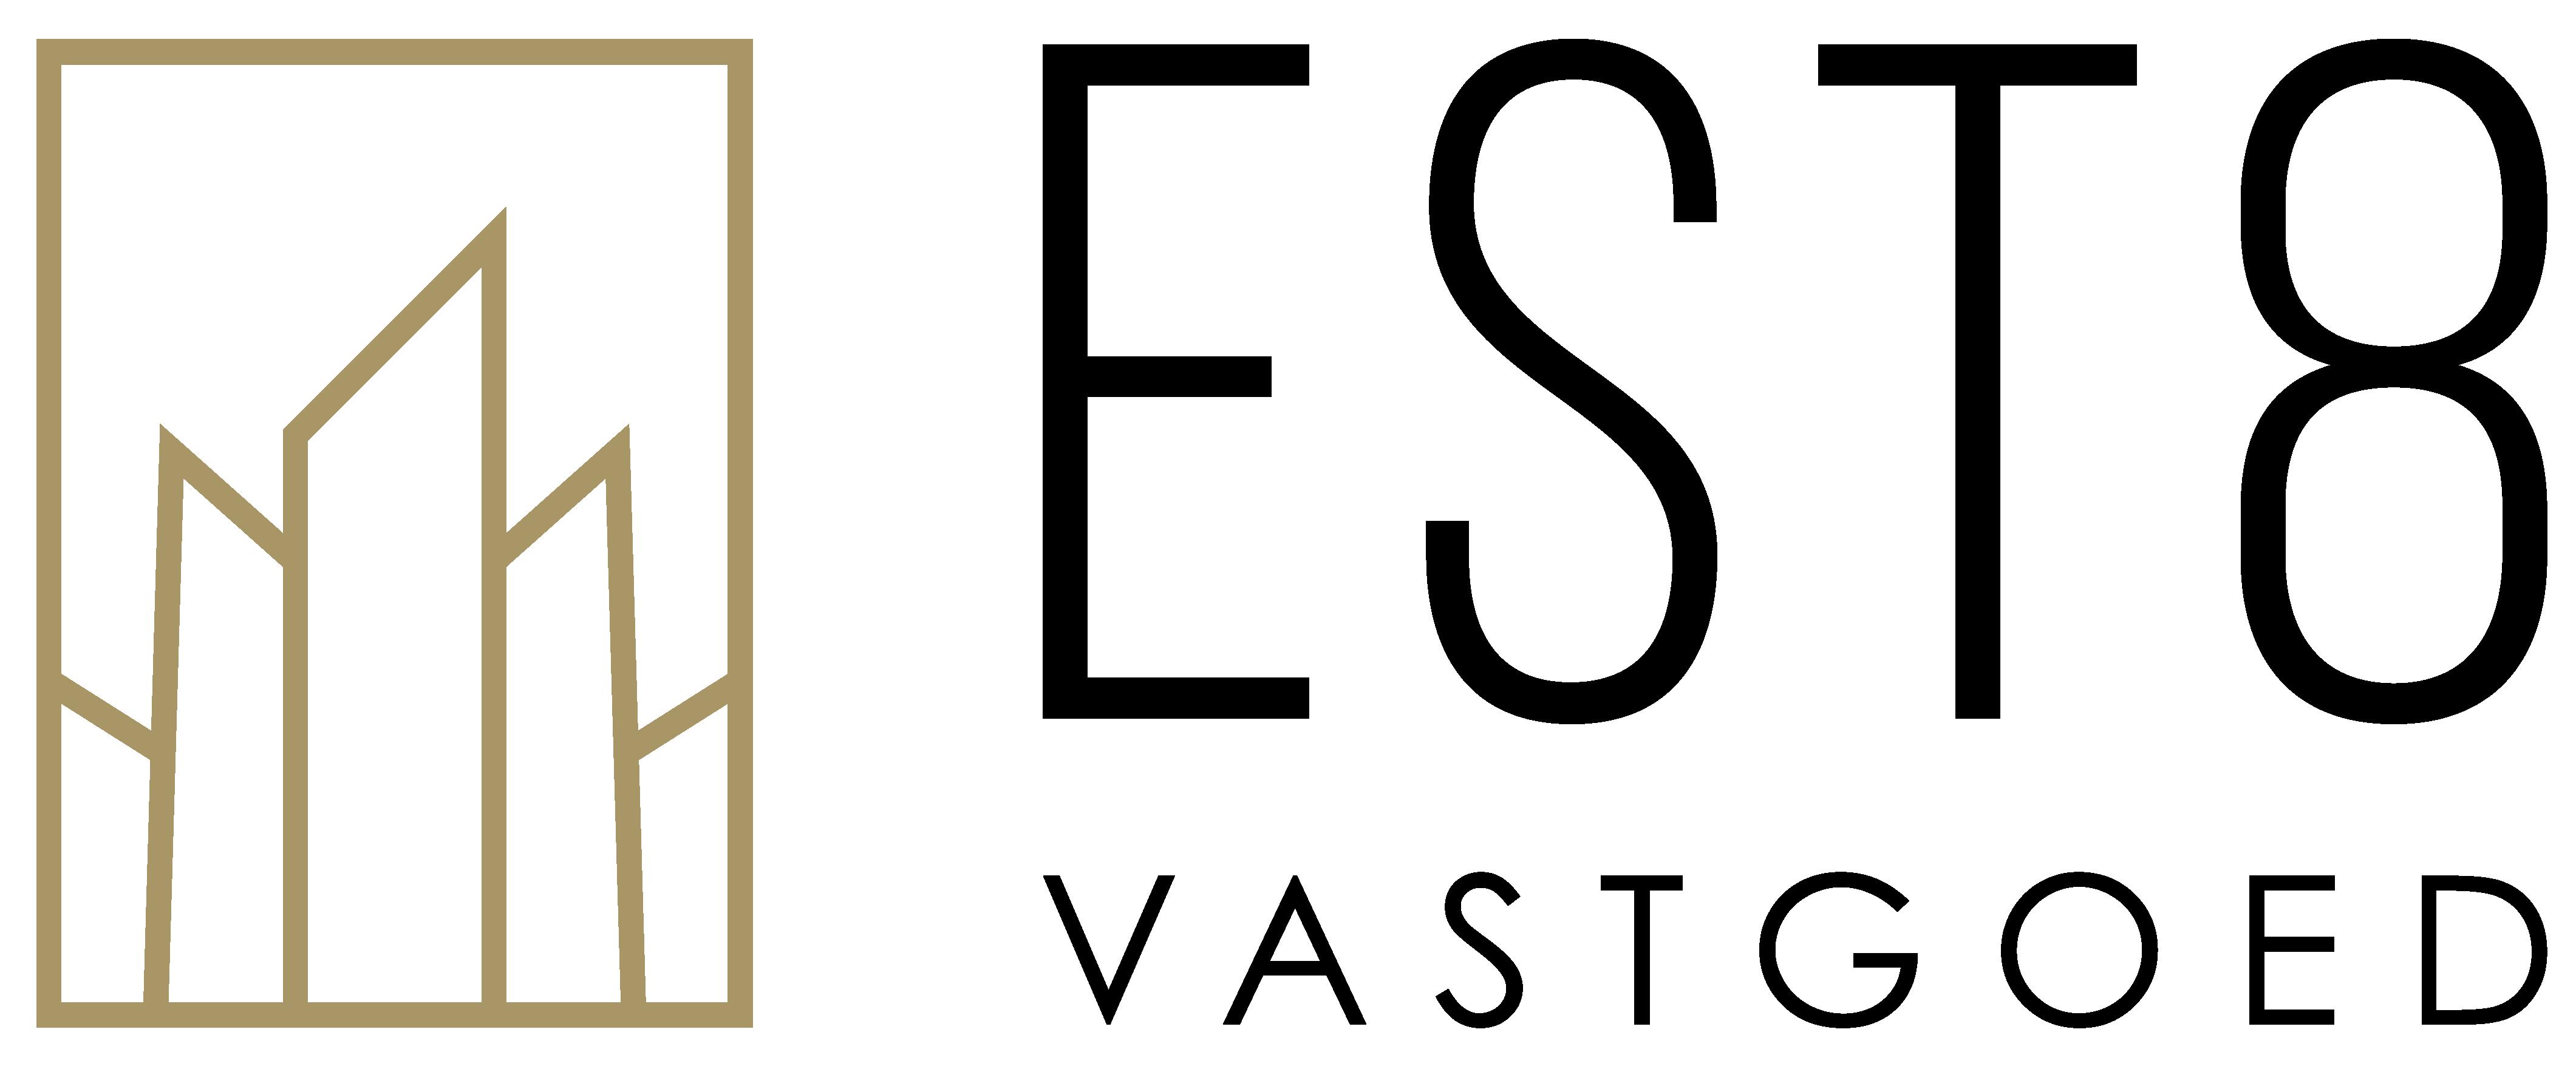 EST8 vastgoed logo